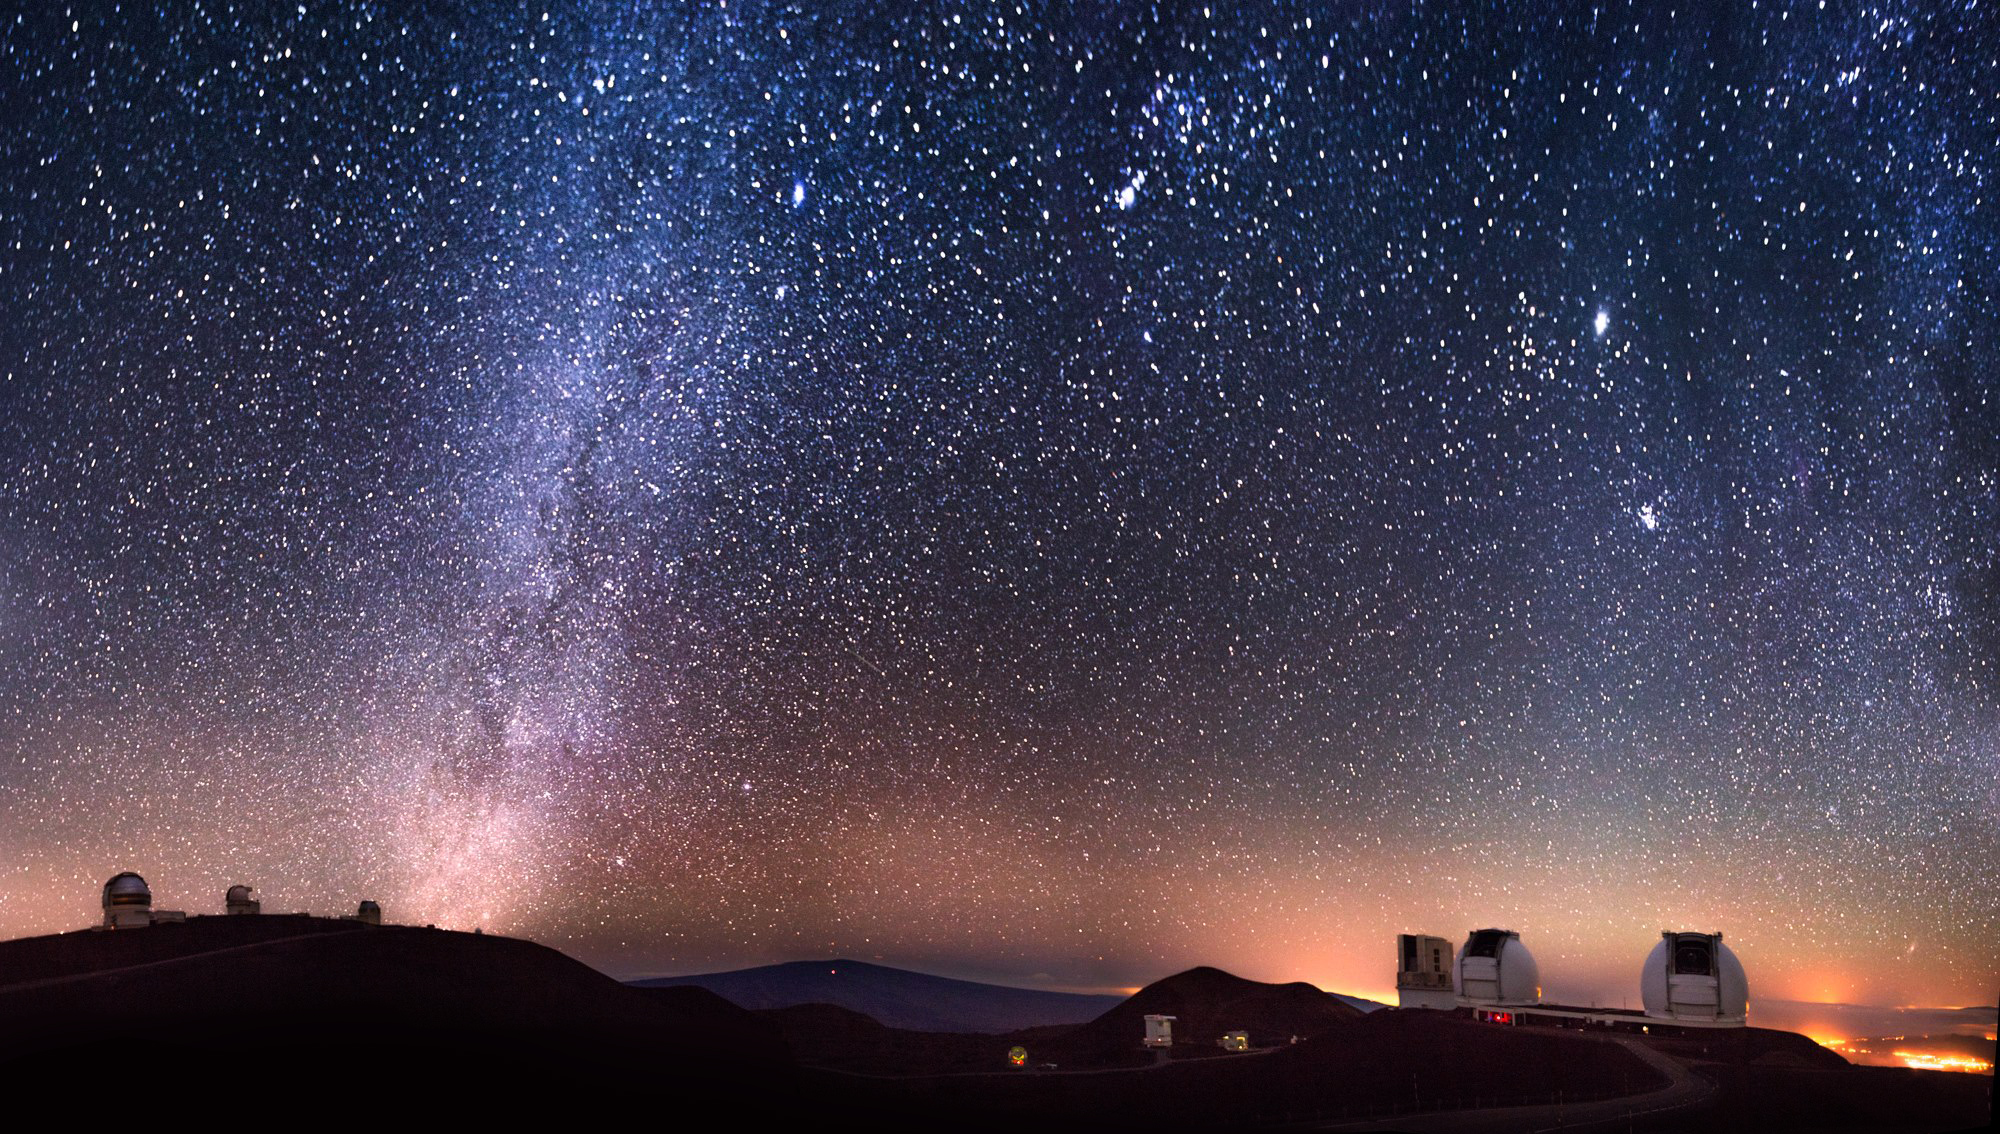 The Keck telescopes atop Maunakea.